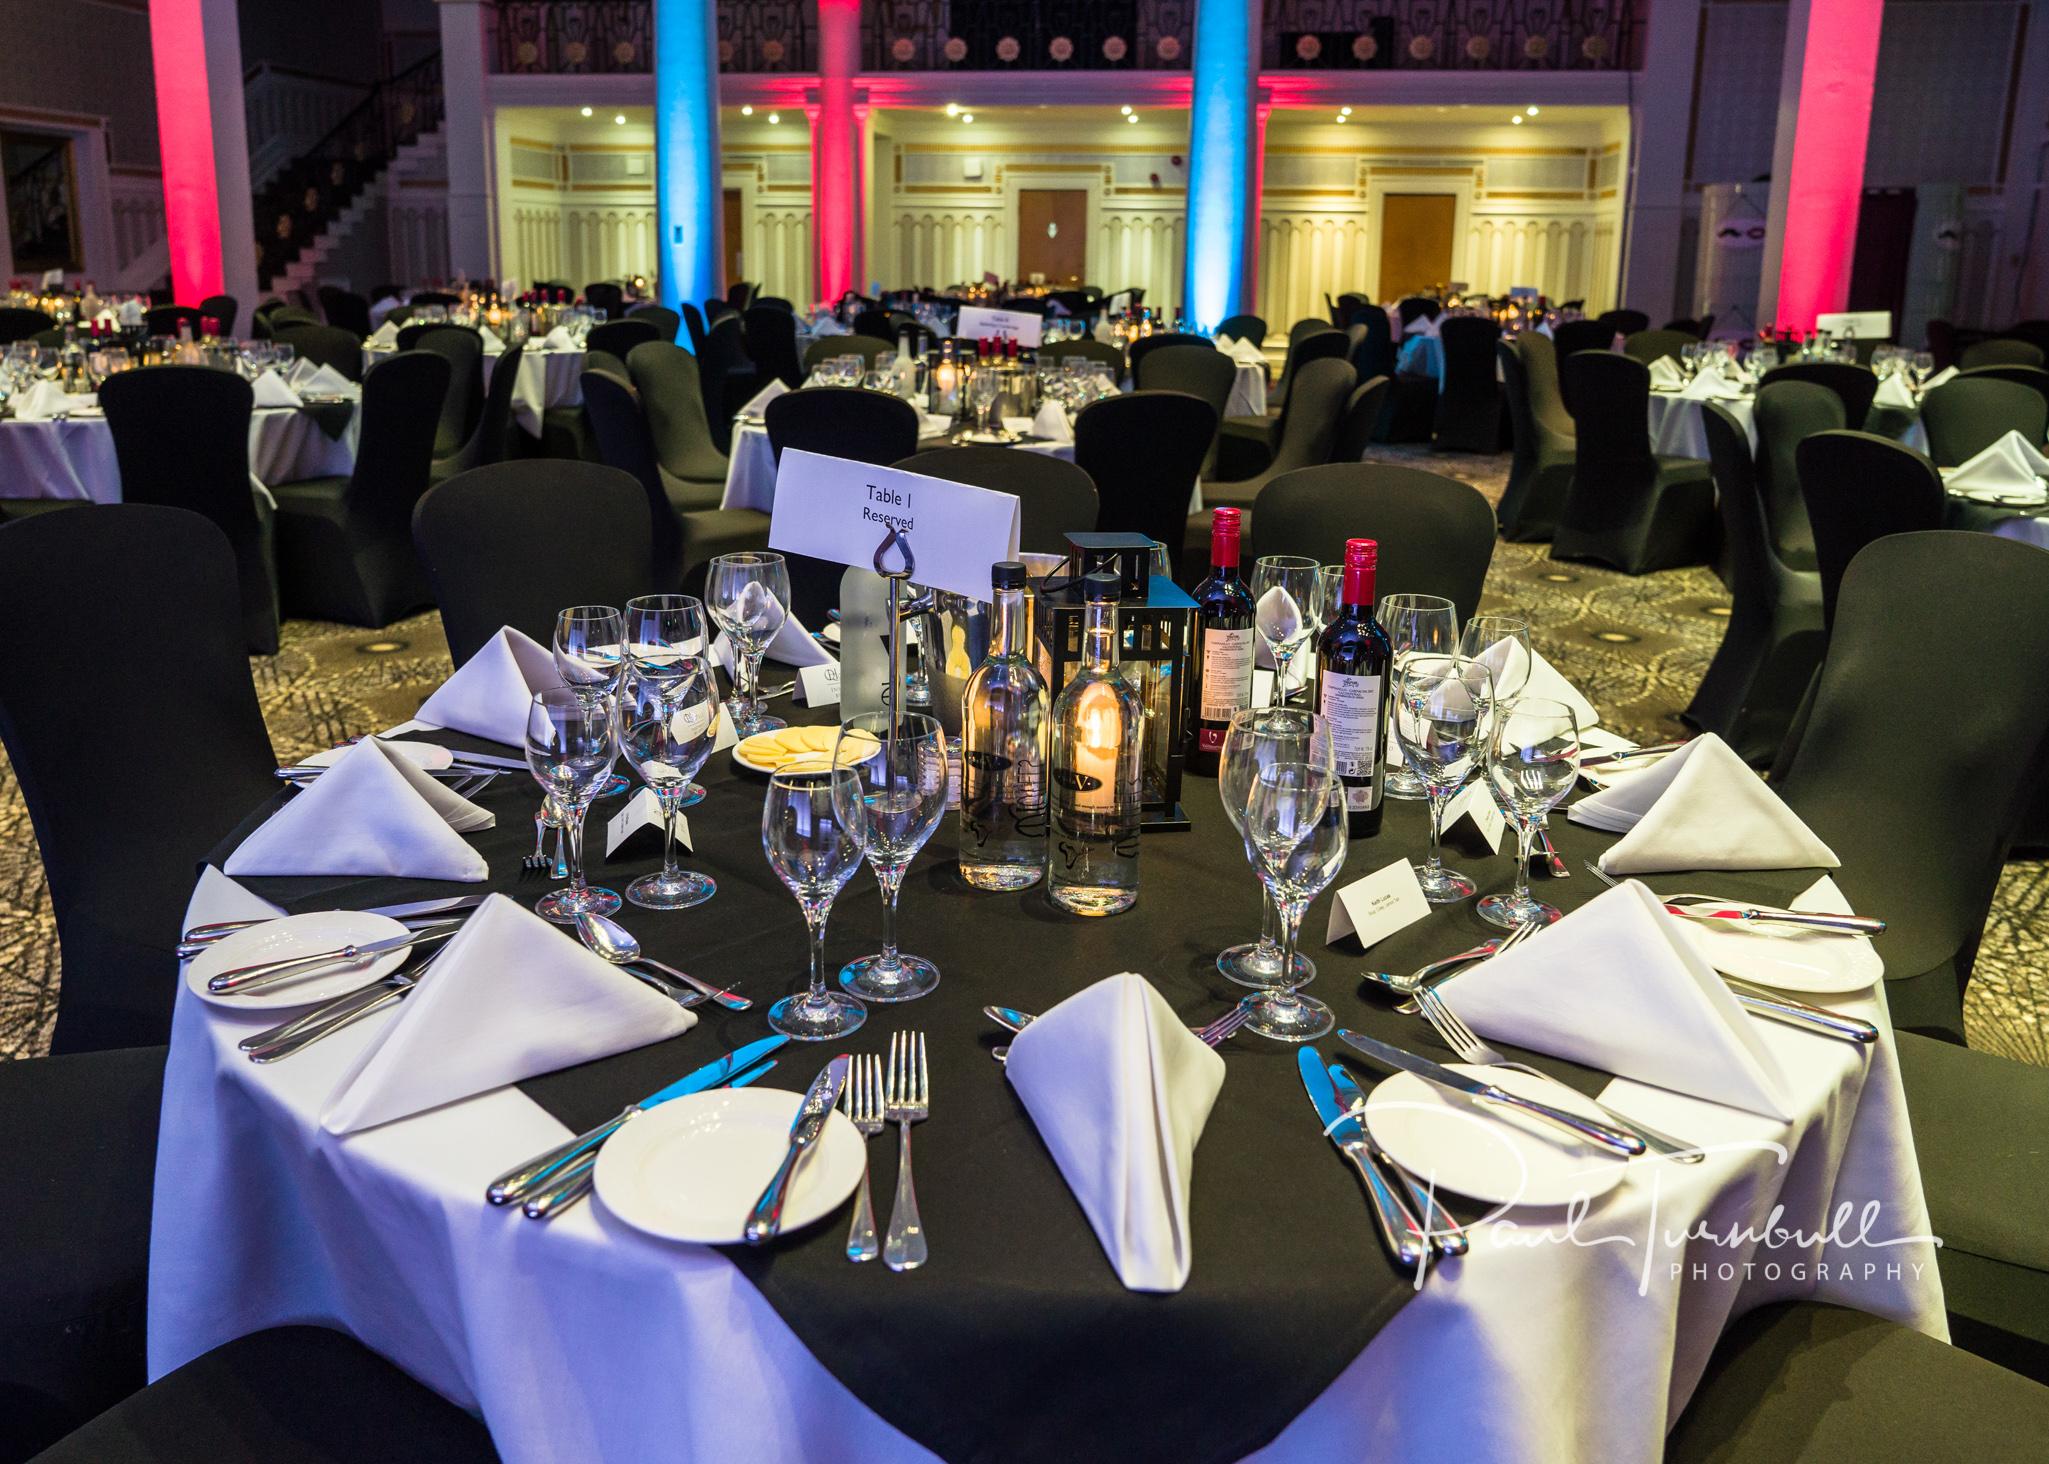 conference-event-photographer-queens-hotel-leeds-yorkshire-003.jpg